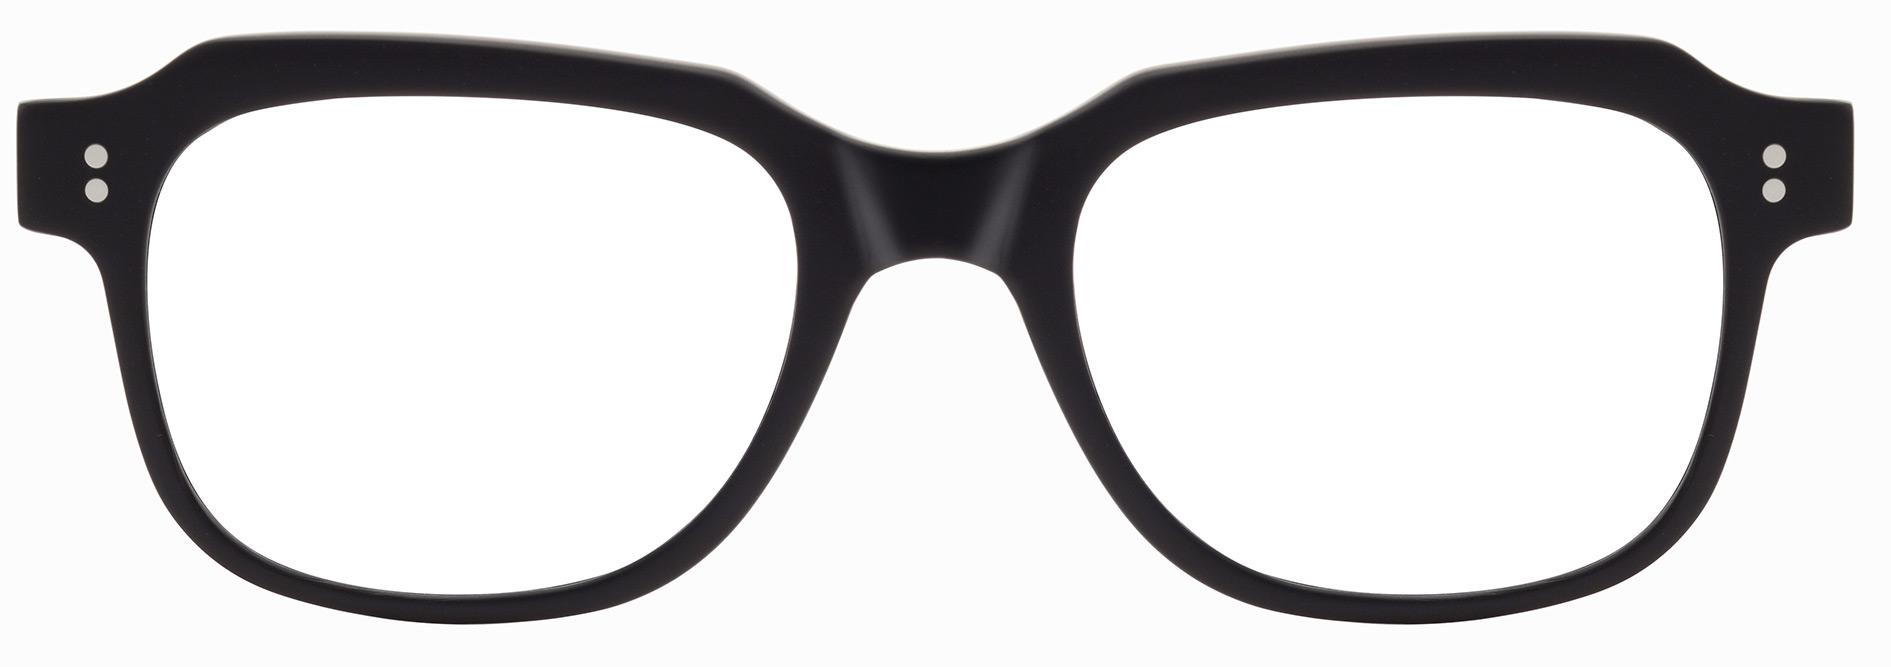 moscot-eyewear-ss2013-20